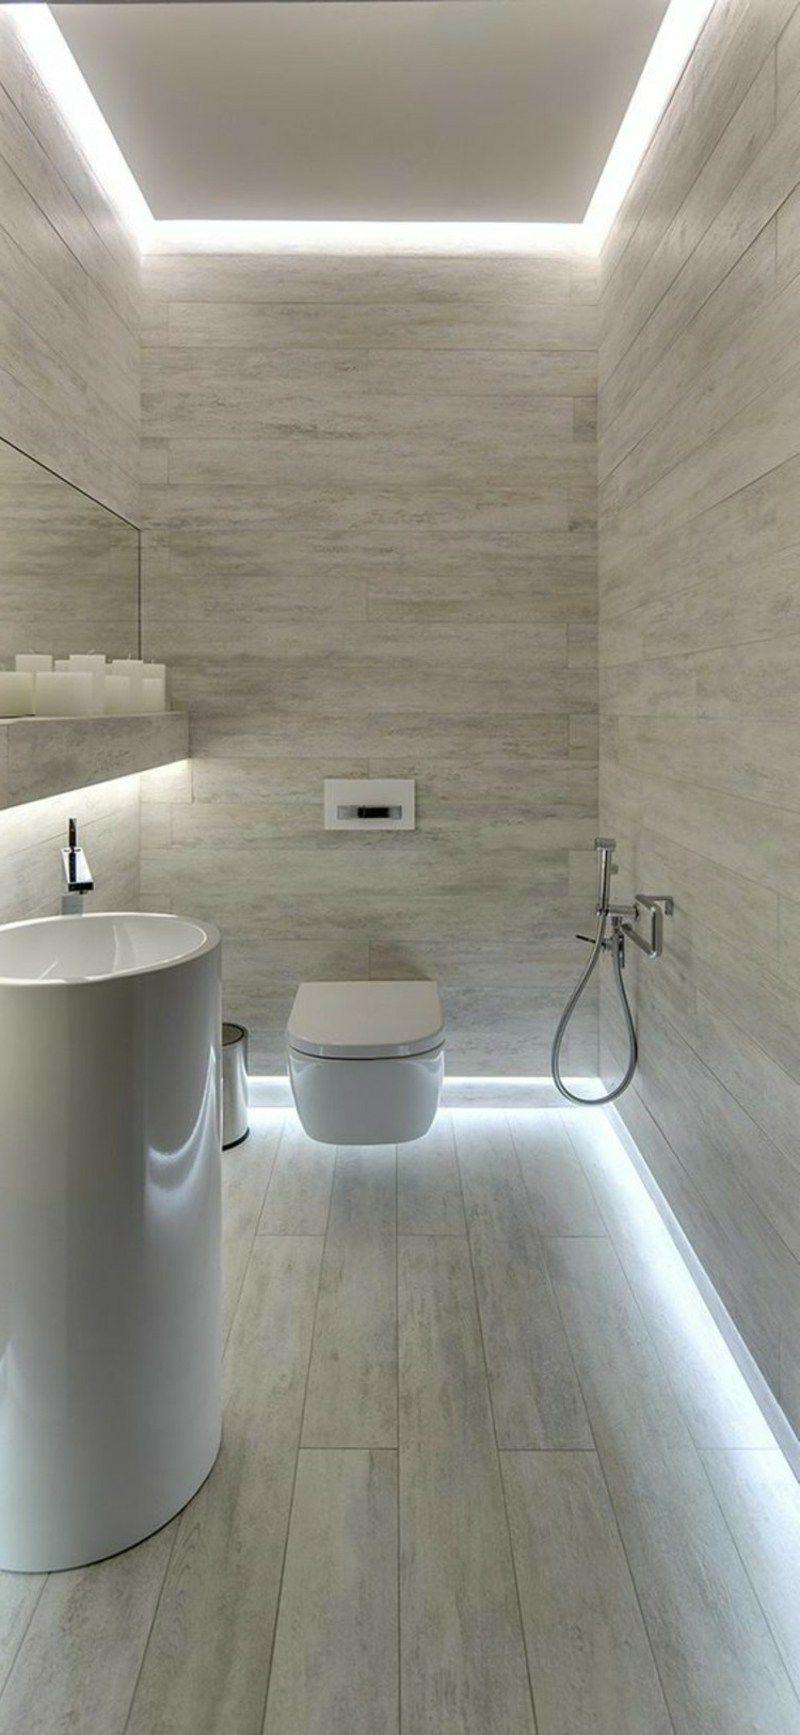 Indirekte Beleuchtung Led Bad In 2020 Indirekte Beleuchtung Led Badezimmereinrichtung Indirekte Beleuchtung